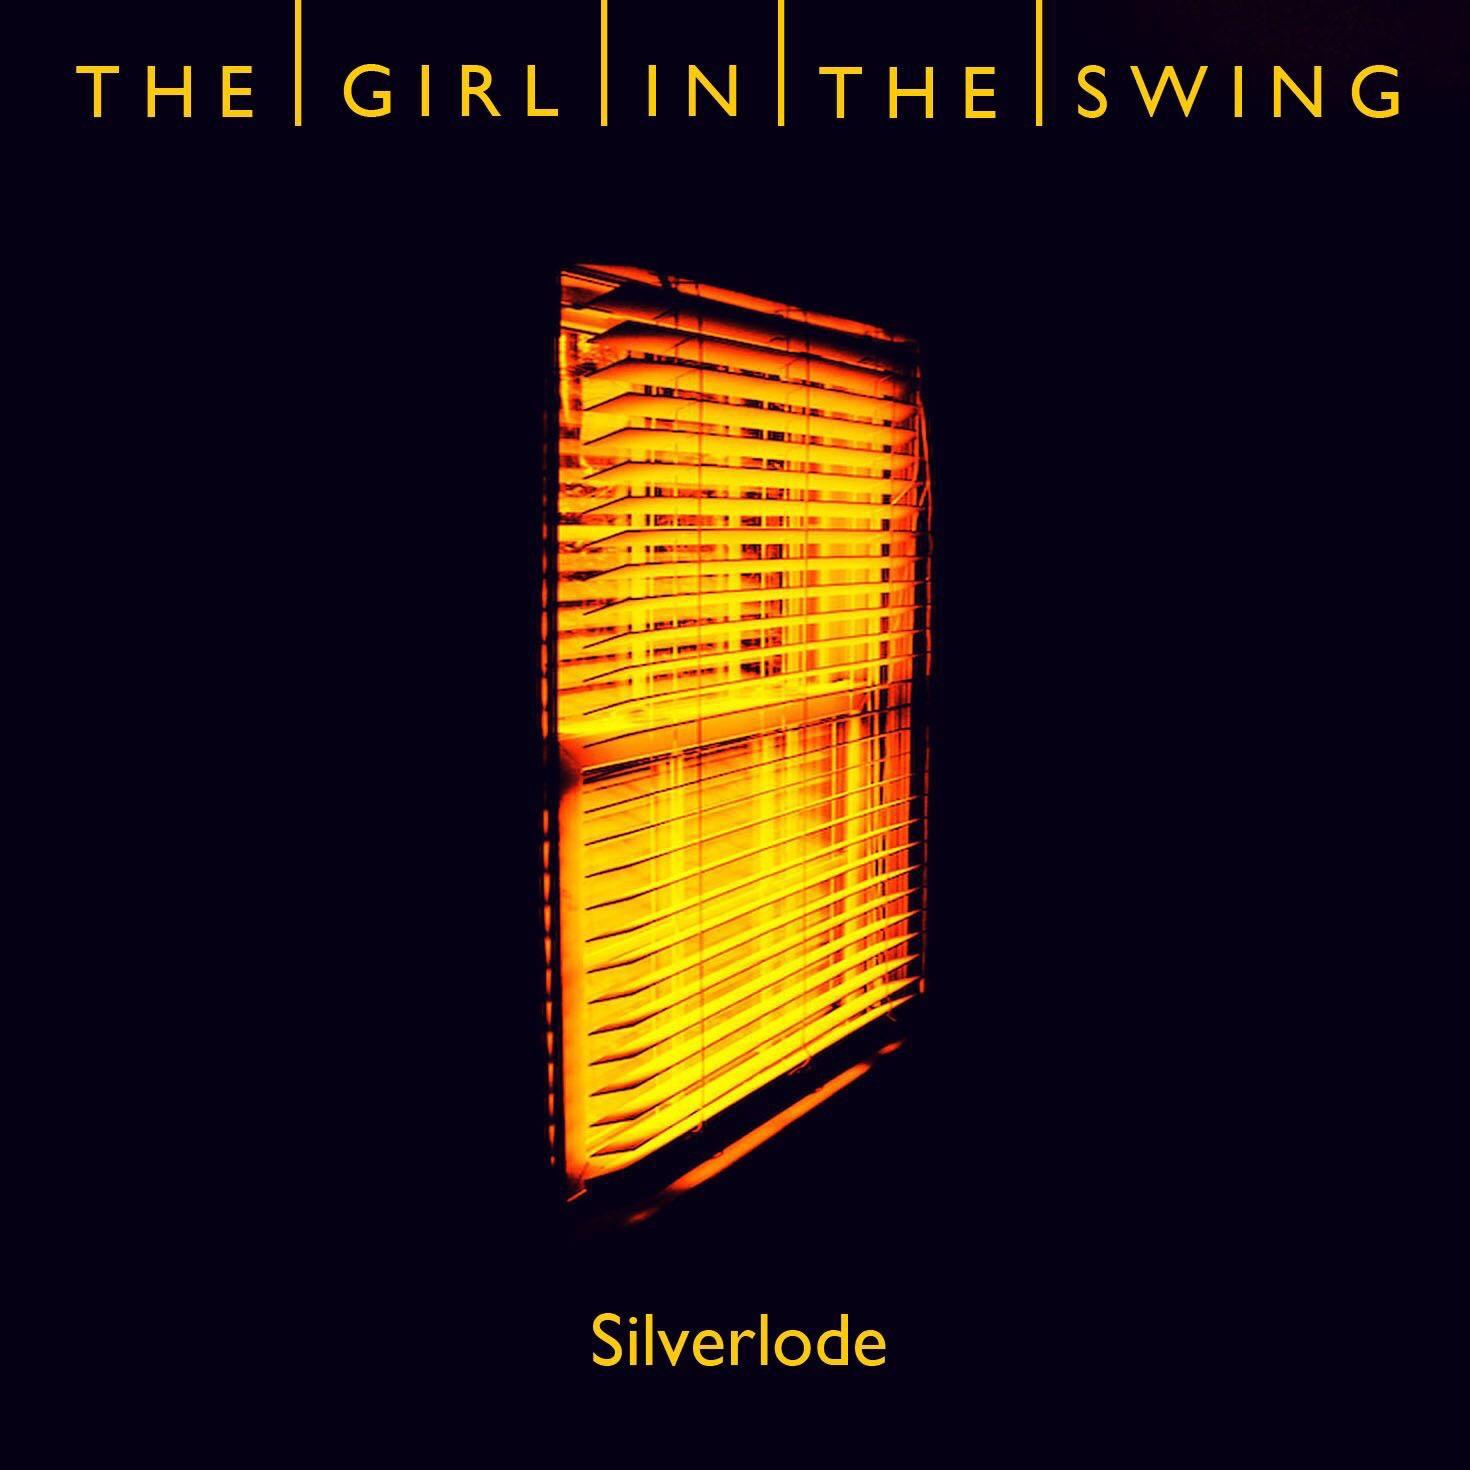 The Girl in the Swing - Single